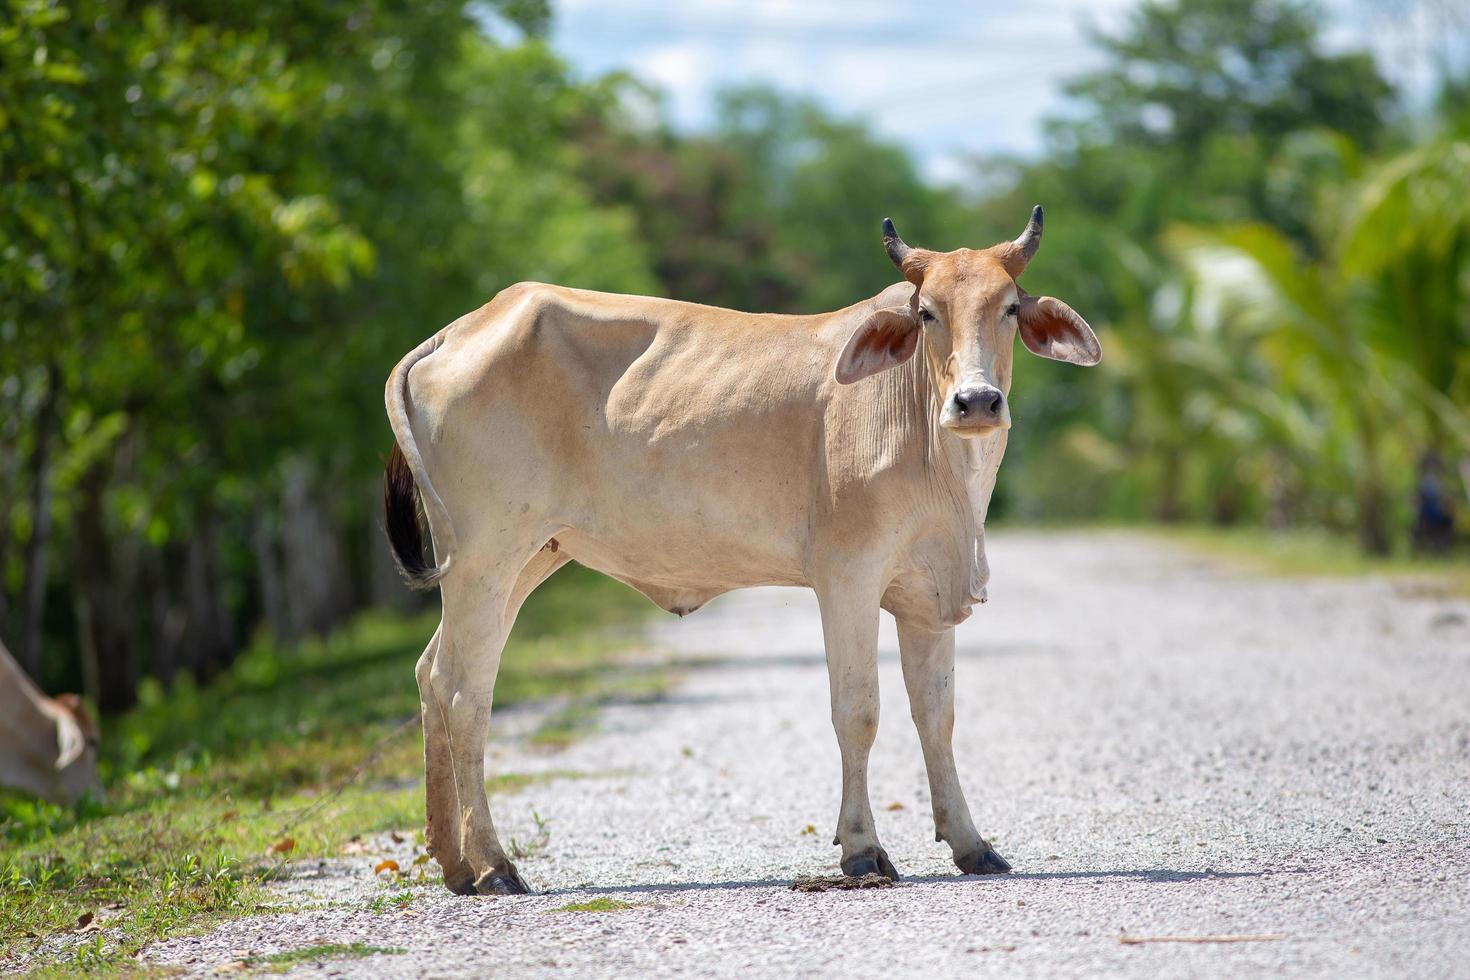 landelijke thailand koe foto